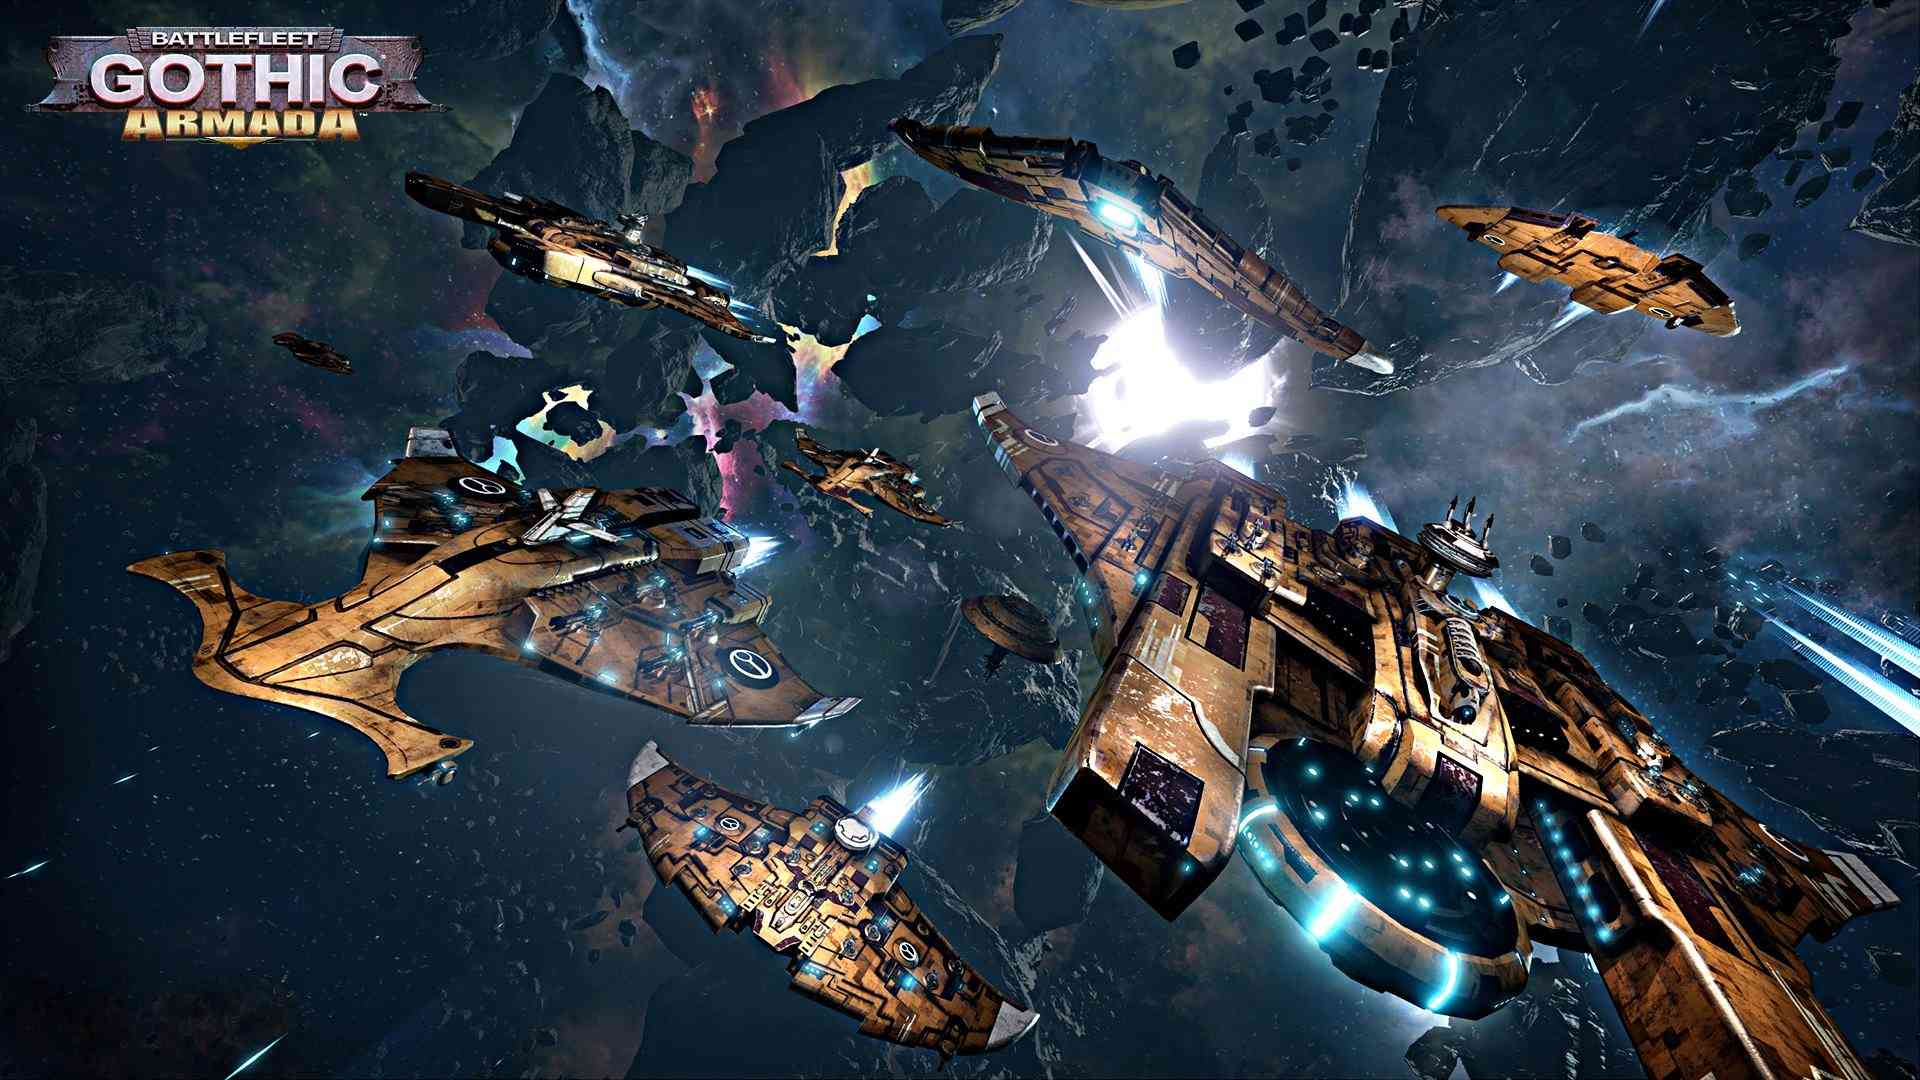 [Jeu vidéo] Battlefleet Gothic : Armada - Page 18 14205910